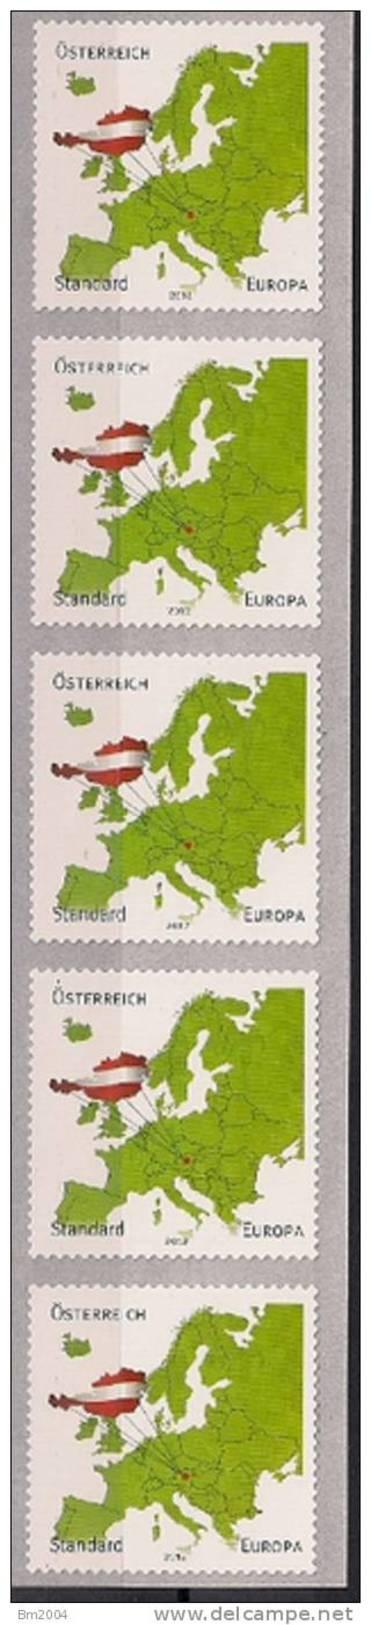 2012 Austria Mi. 3006 I  ** MNH   First  Edition Austria Maps - 2011-... Nuevos & Fijasellos